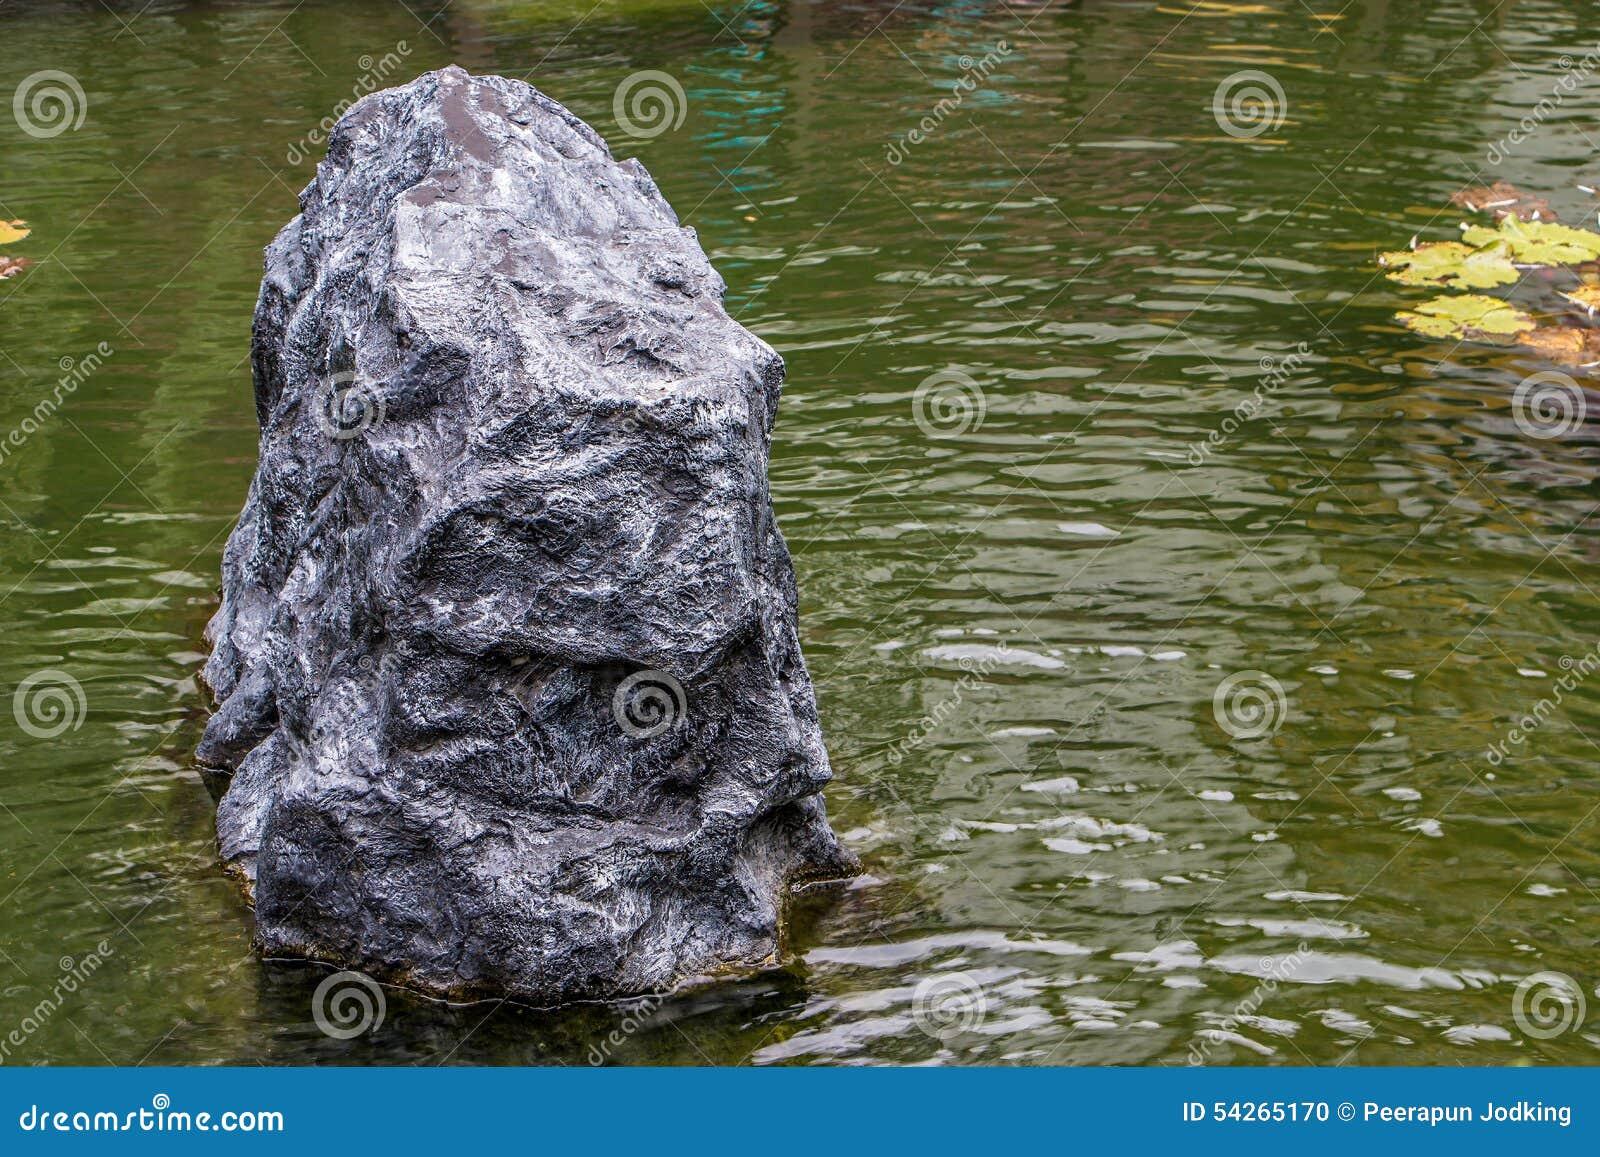 Charming Big Black Stones In Water Garden Background